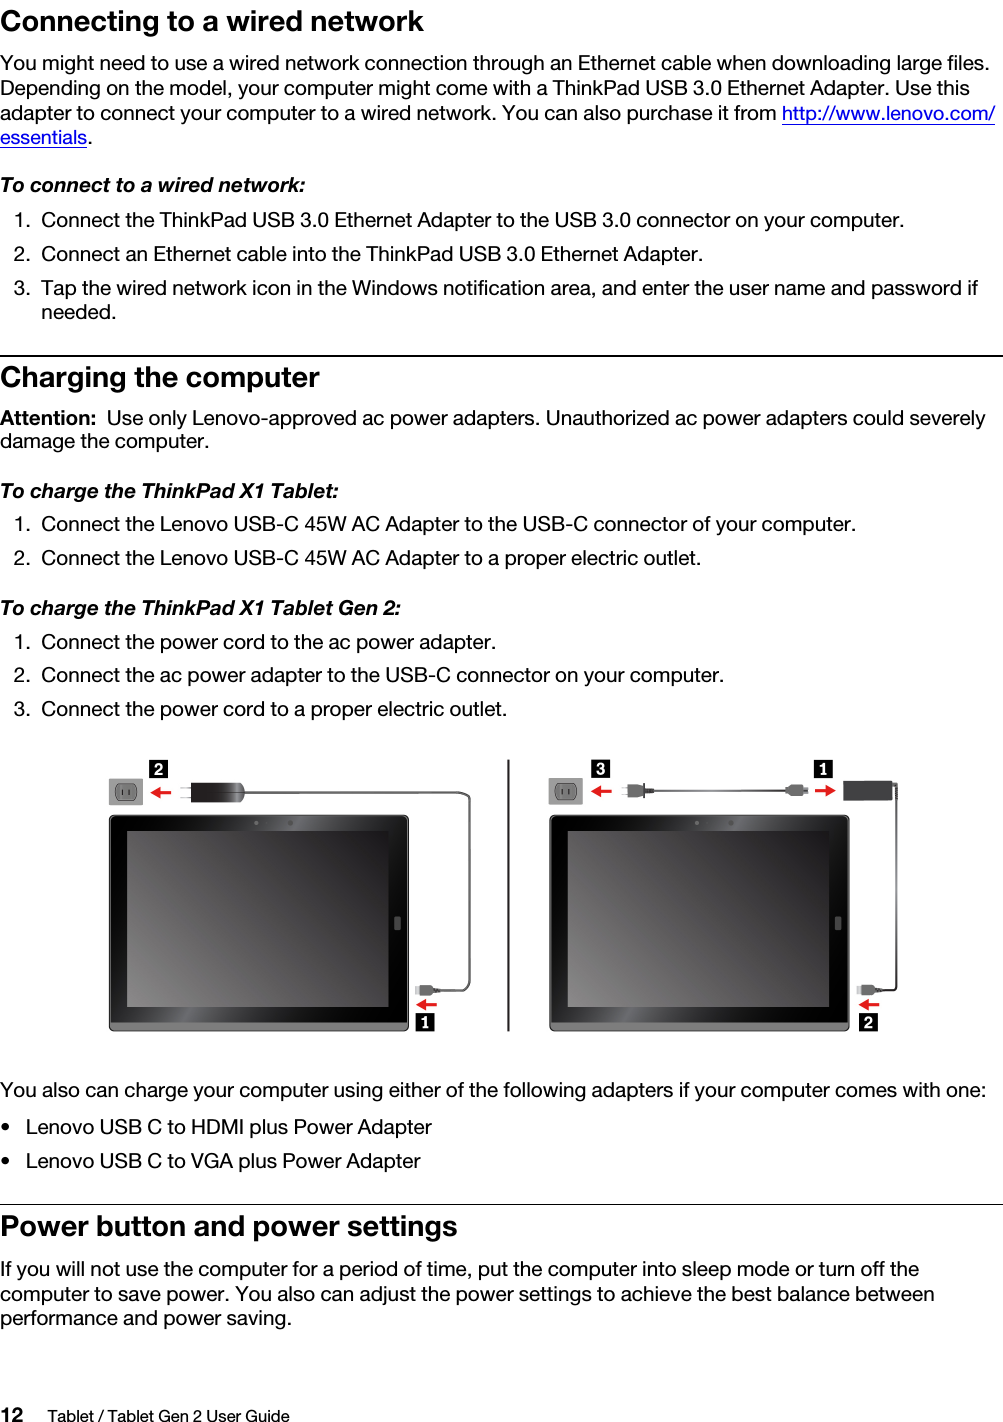 Lenovo X1 Tablet Gen 2 Ug En / User Guide Manual (English